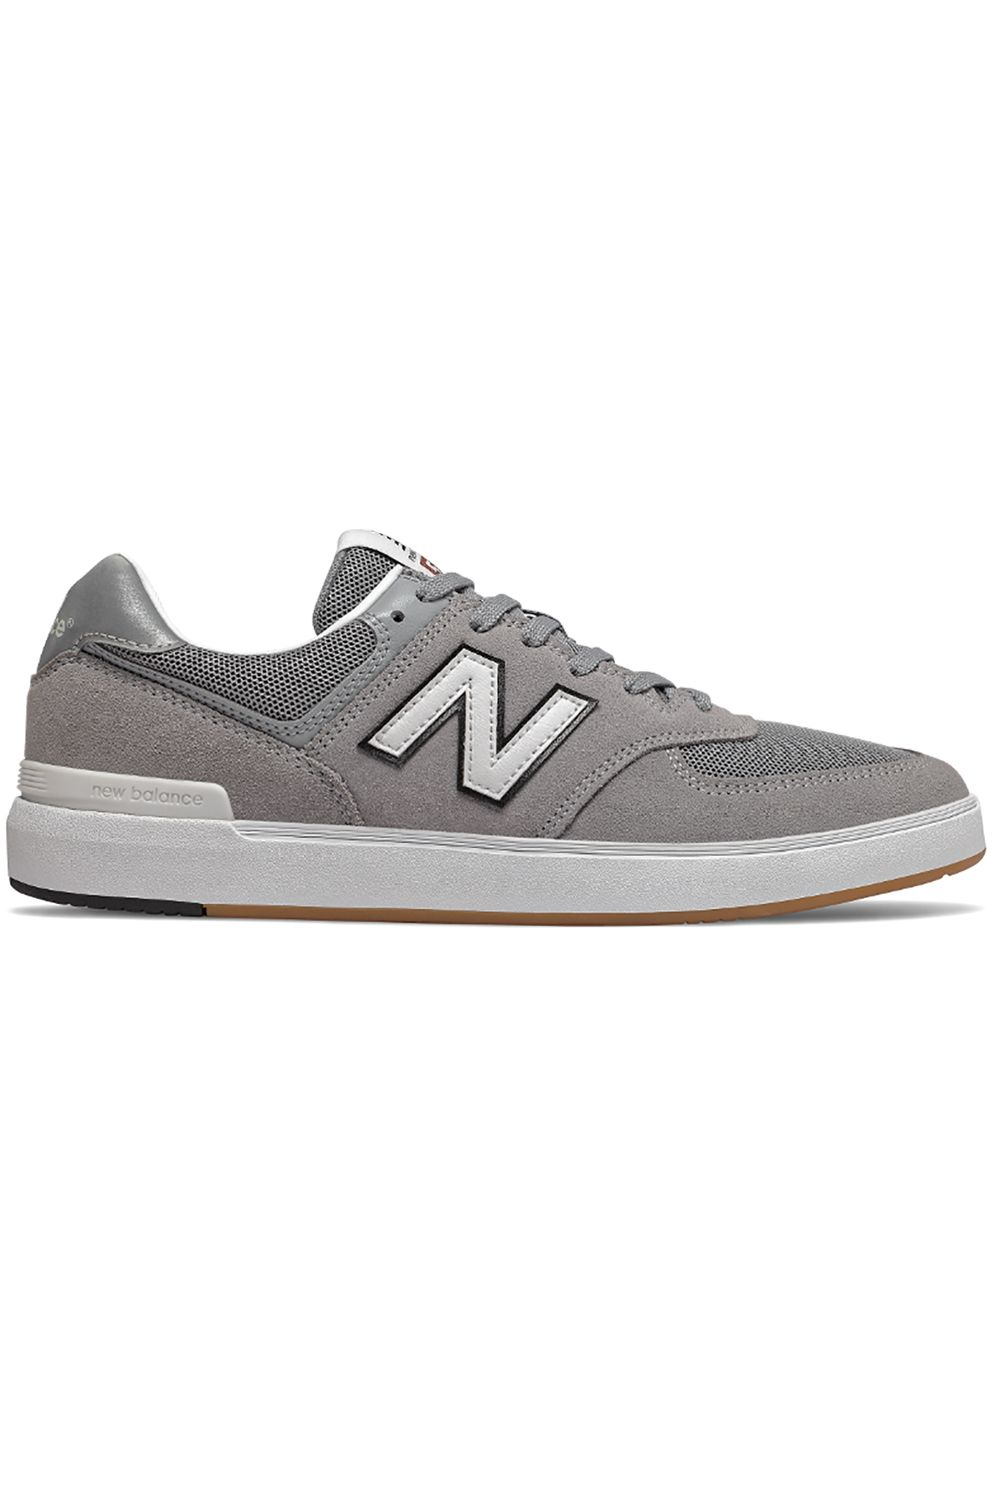 b939728dc3 Tenis New Balance AM574 Steel Grey